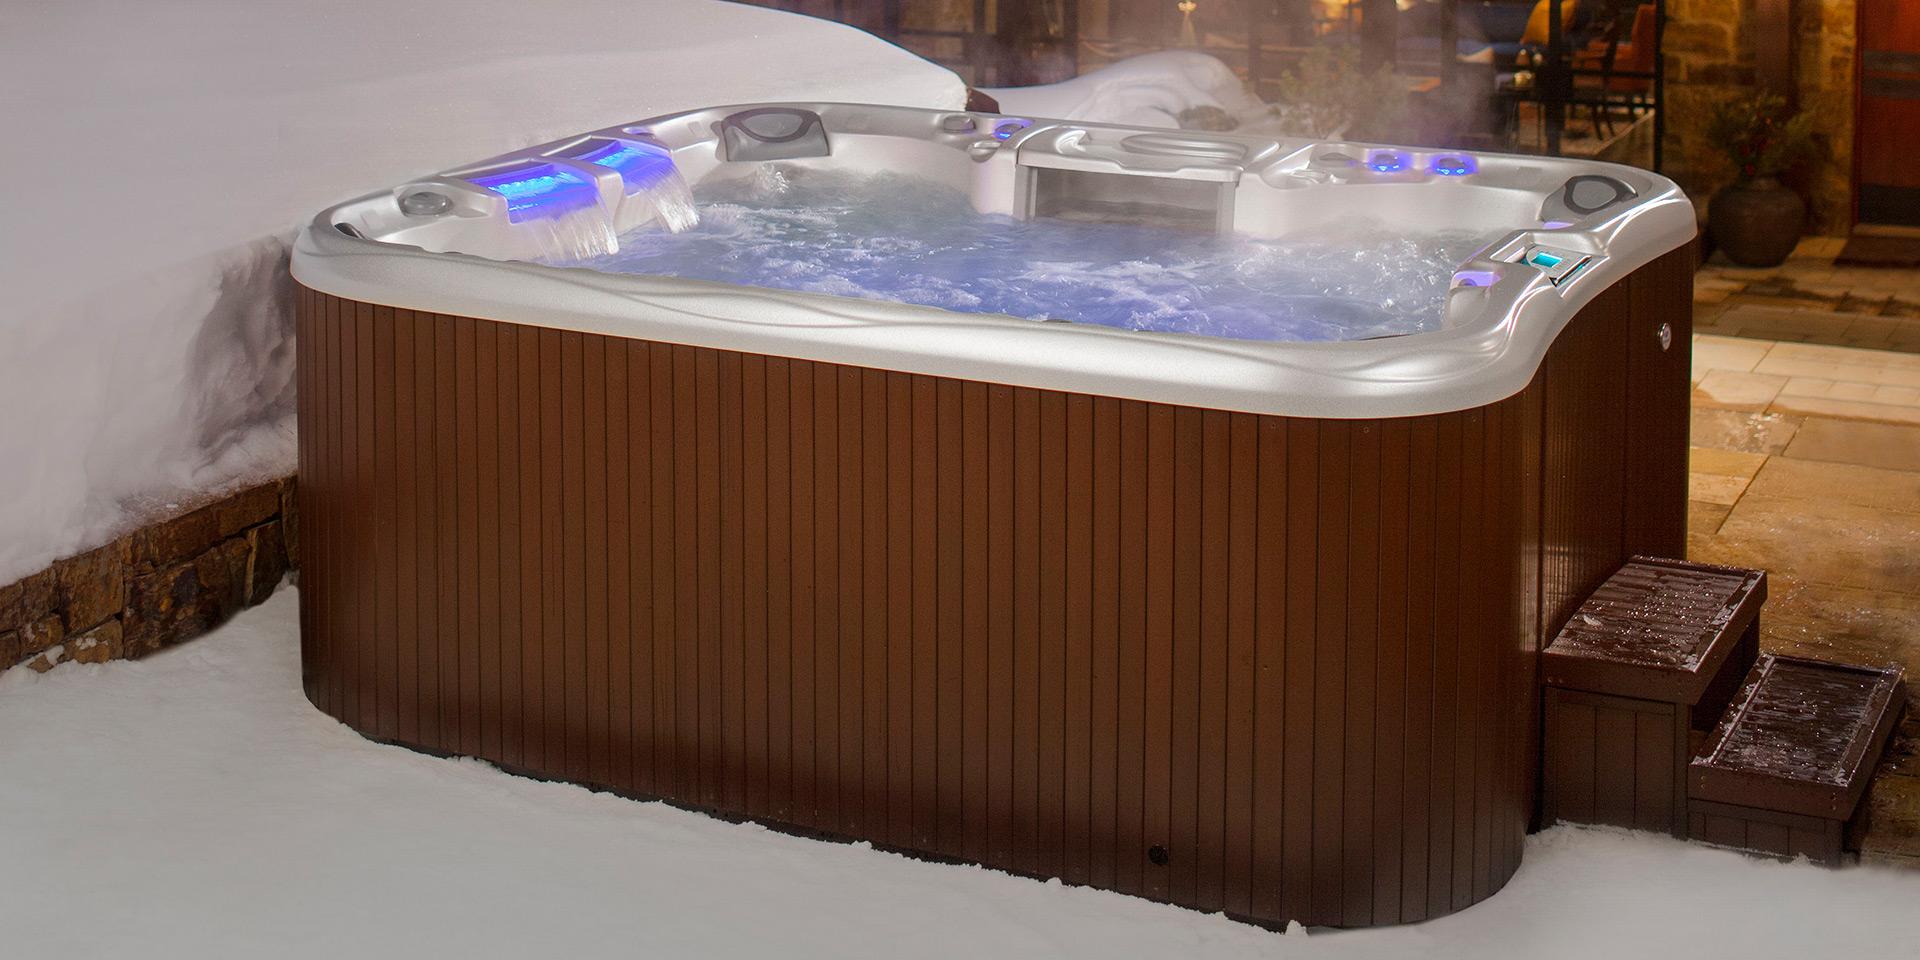 Winterizing your spa